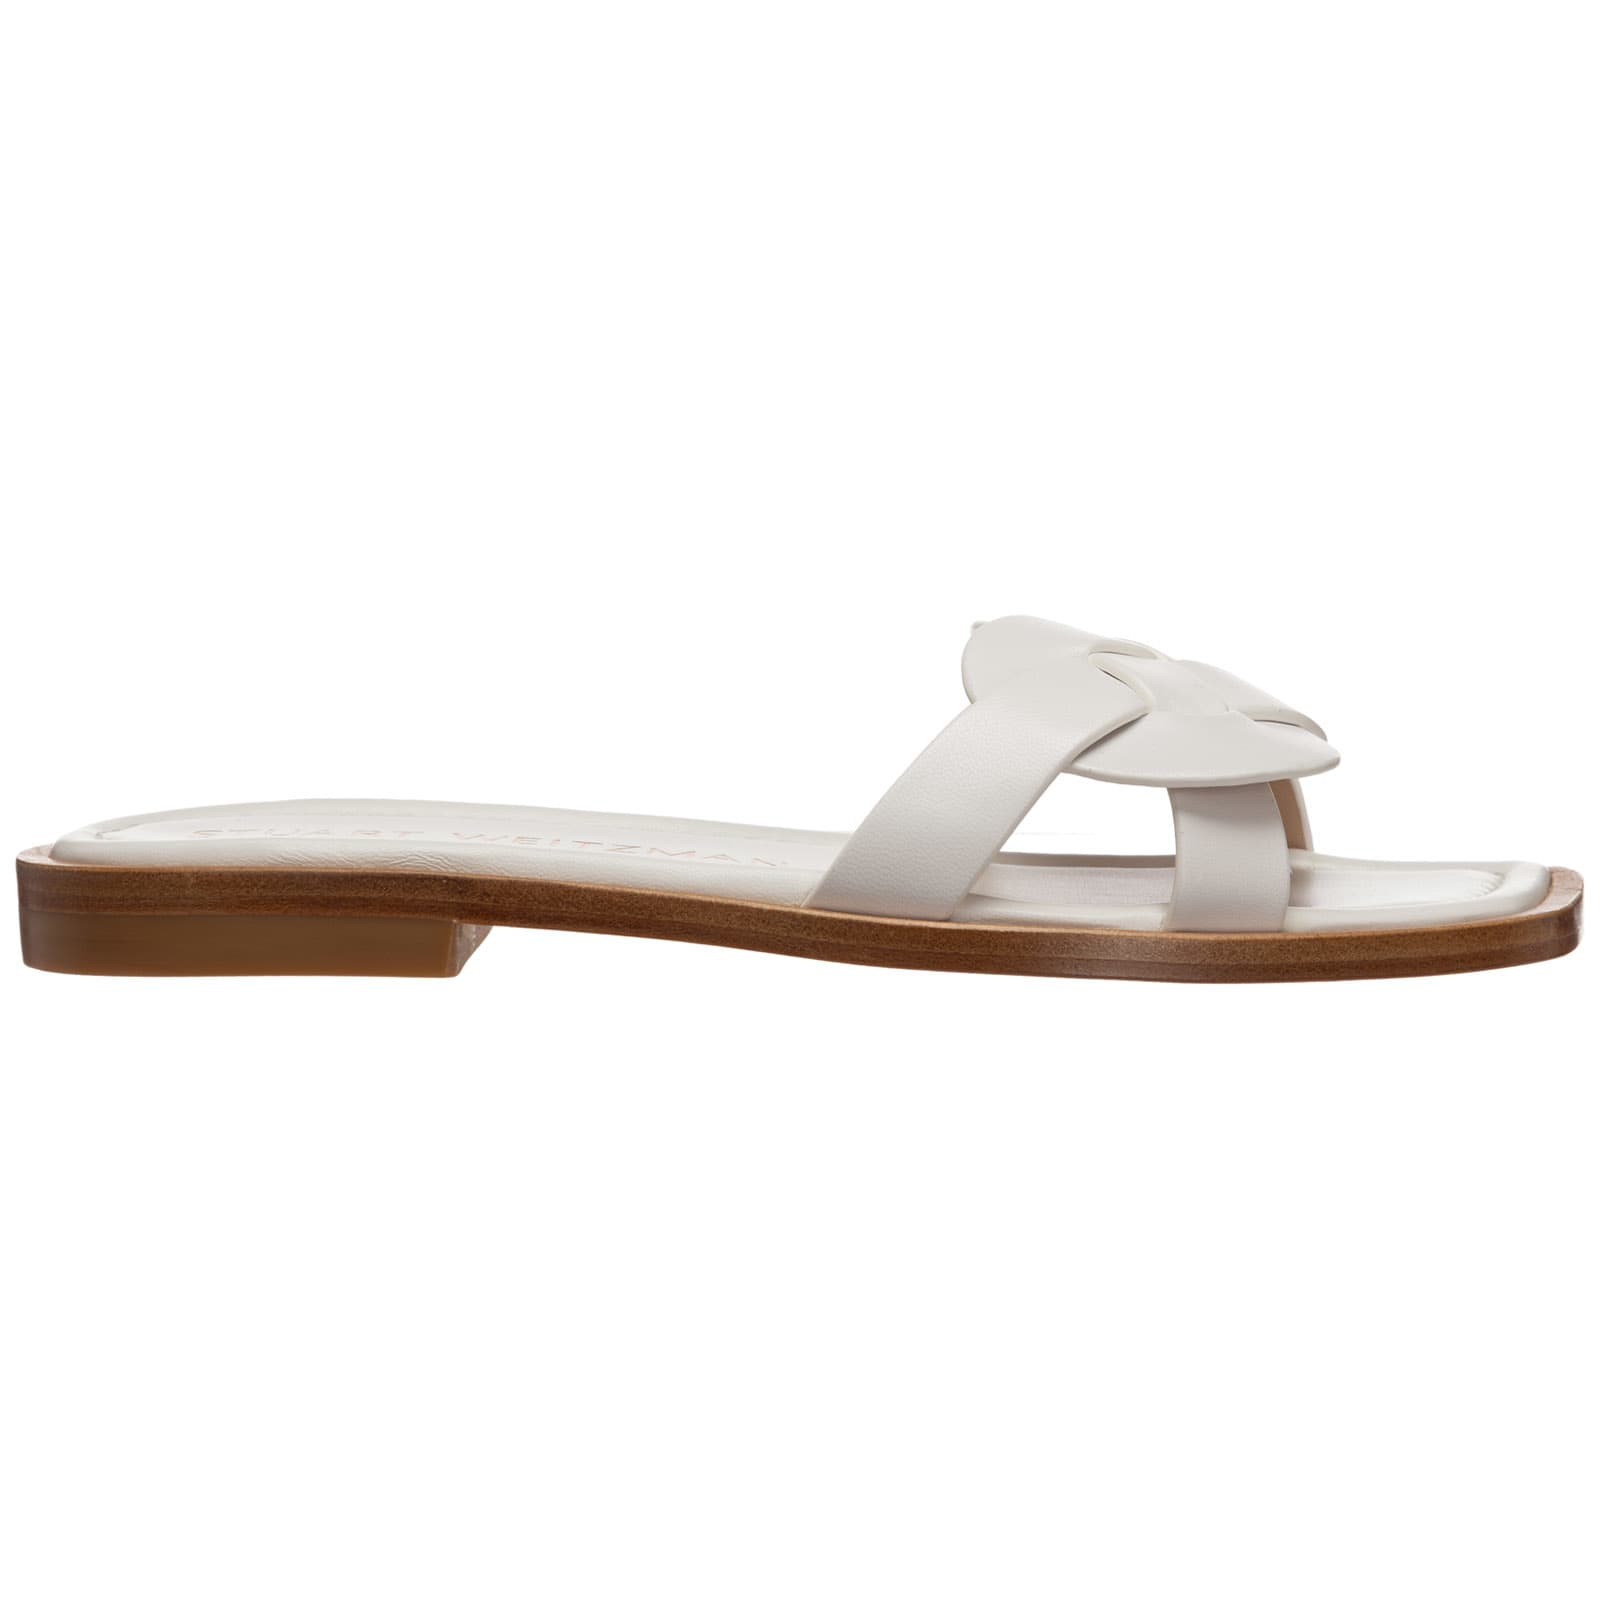 Stuart Weitzman Sierra Sandals